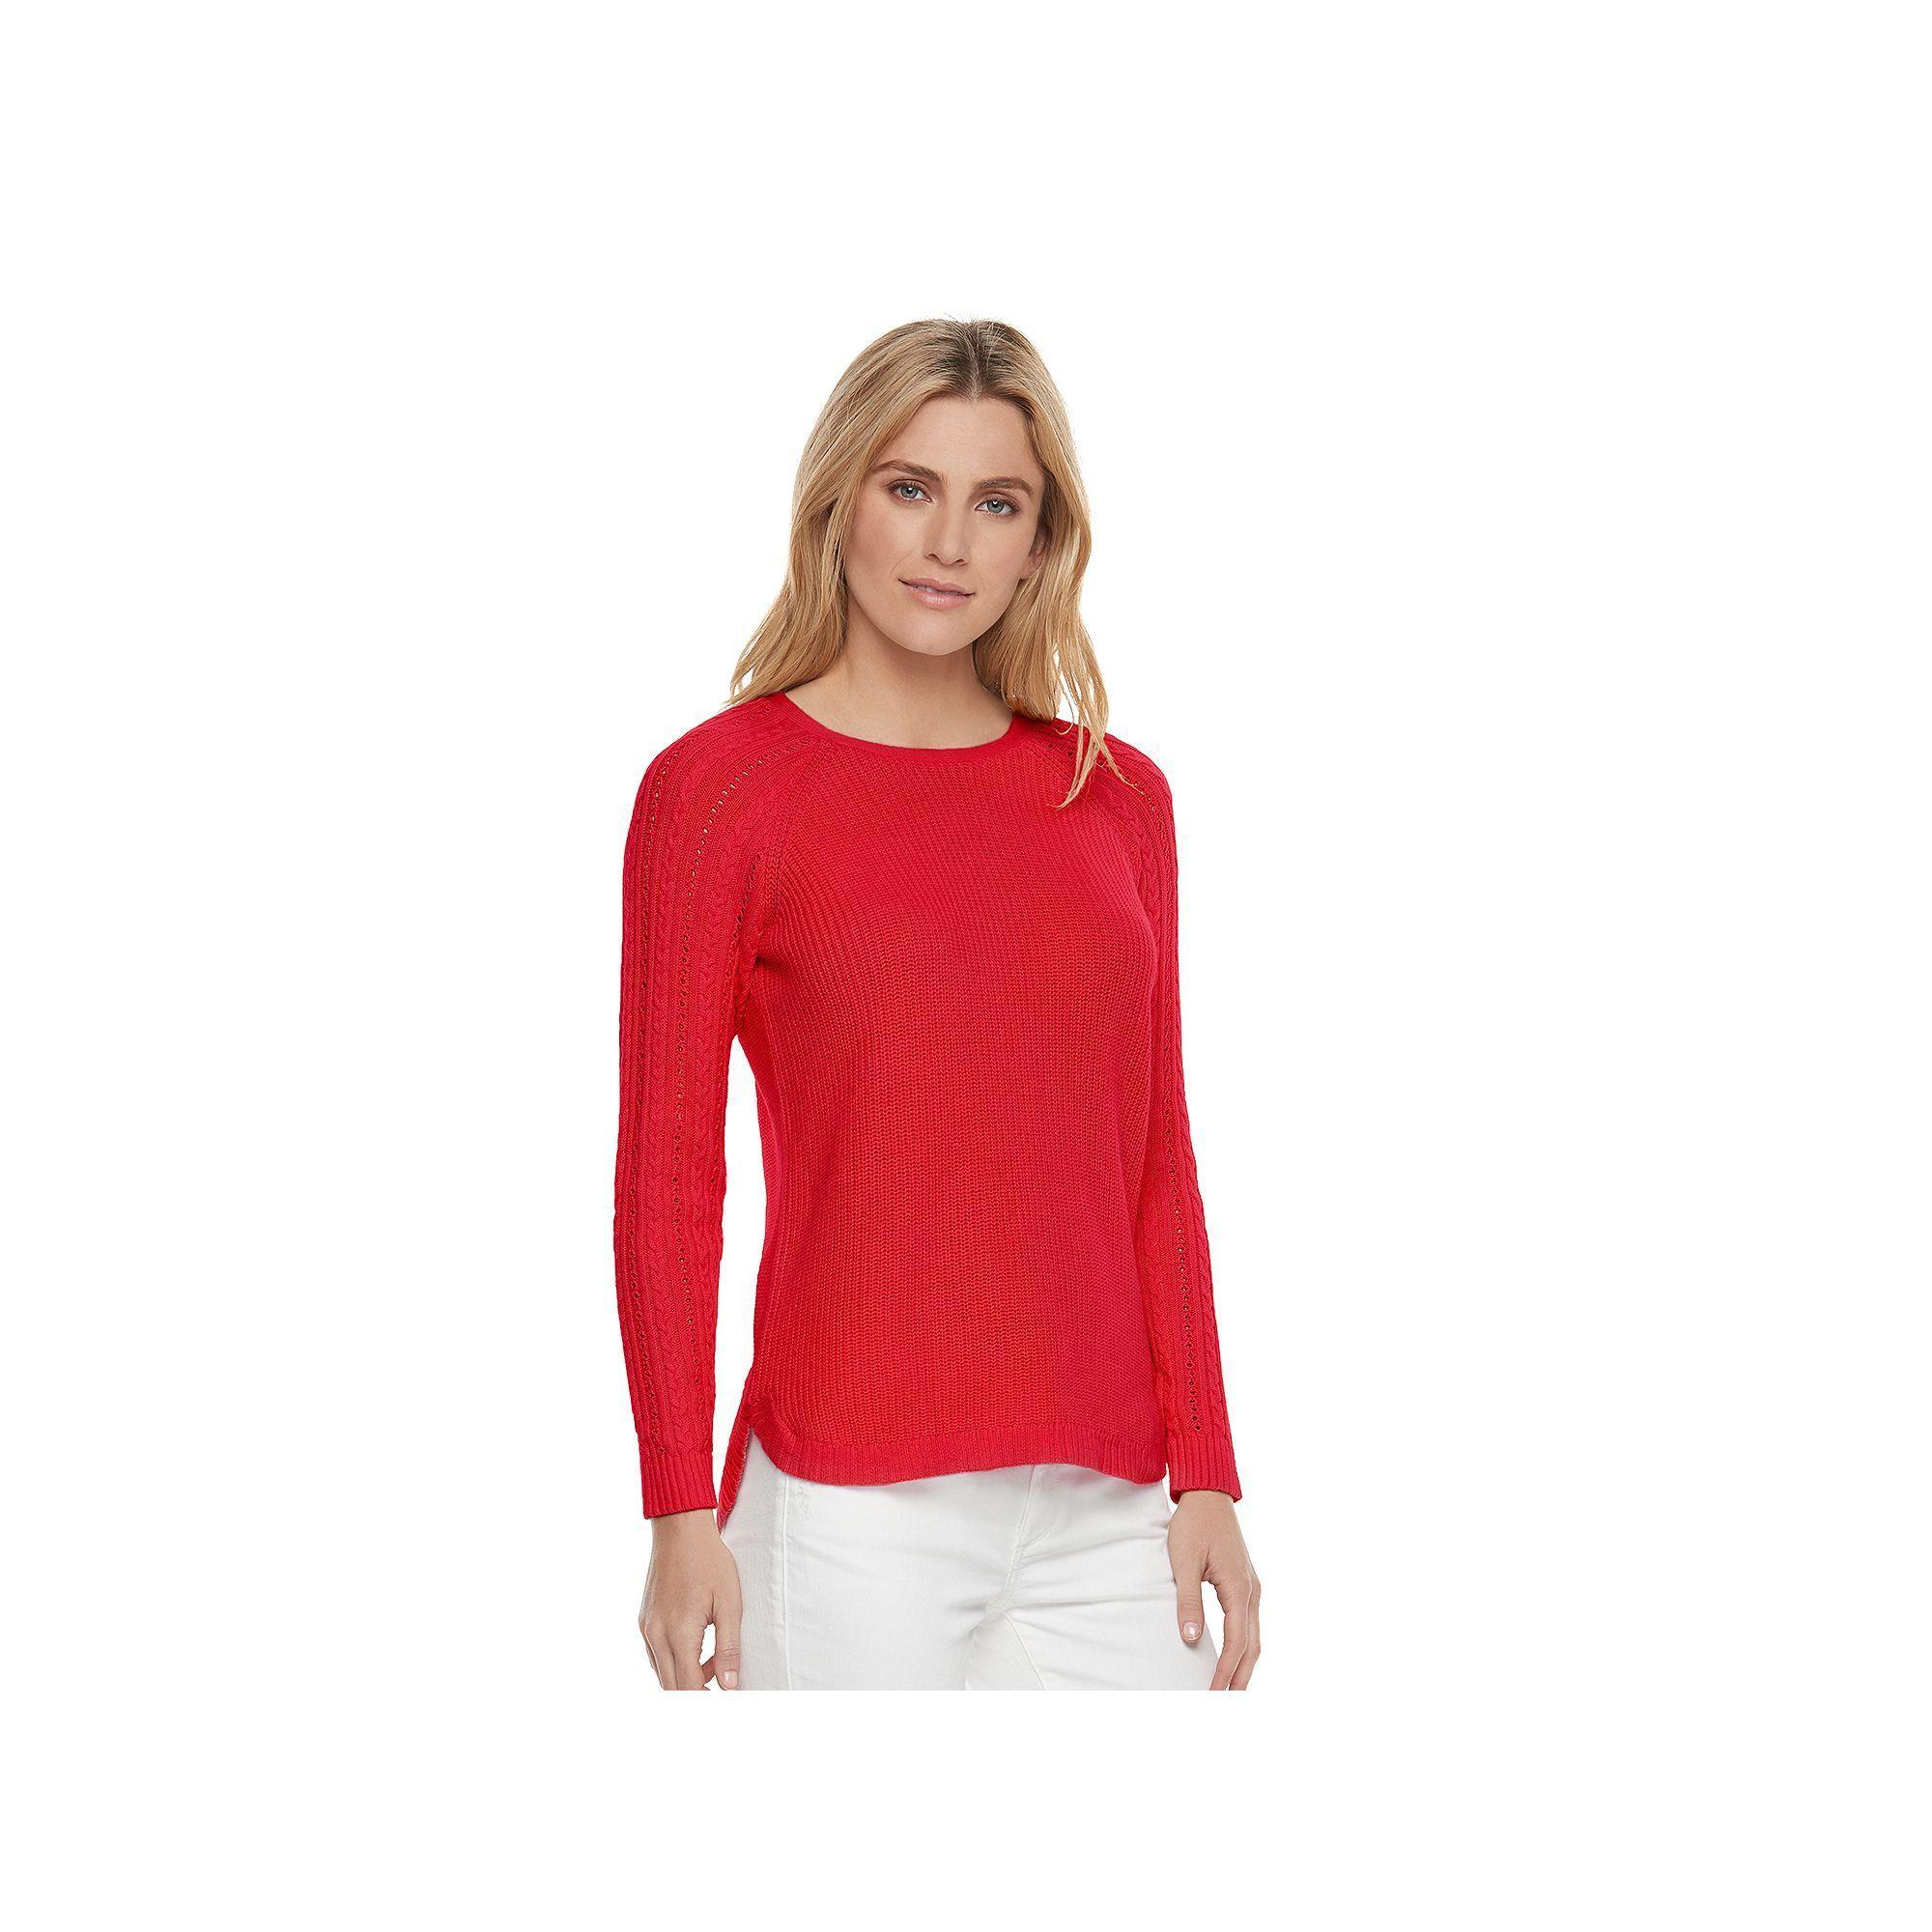 "006eedf29e3f3 Women s SONOMA Goods for Lifeâ""¢ Pointelle Crewneck Sweater"